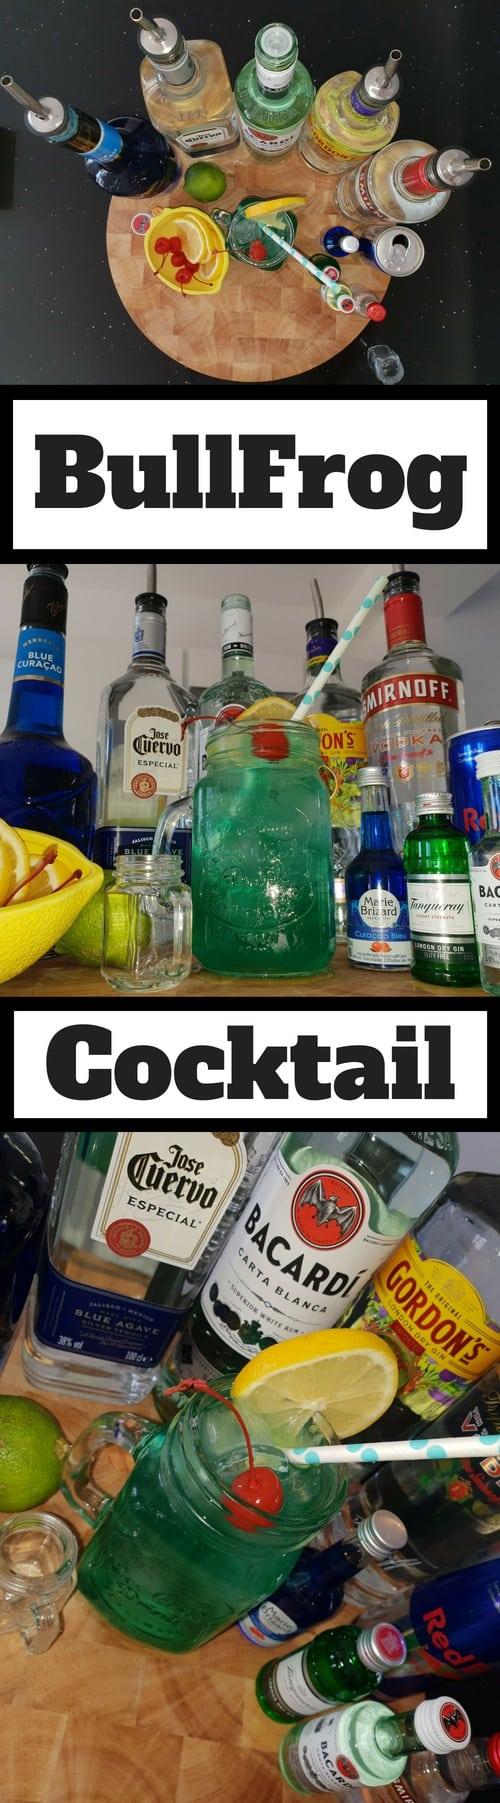 Bullfrog Cocktail Drink